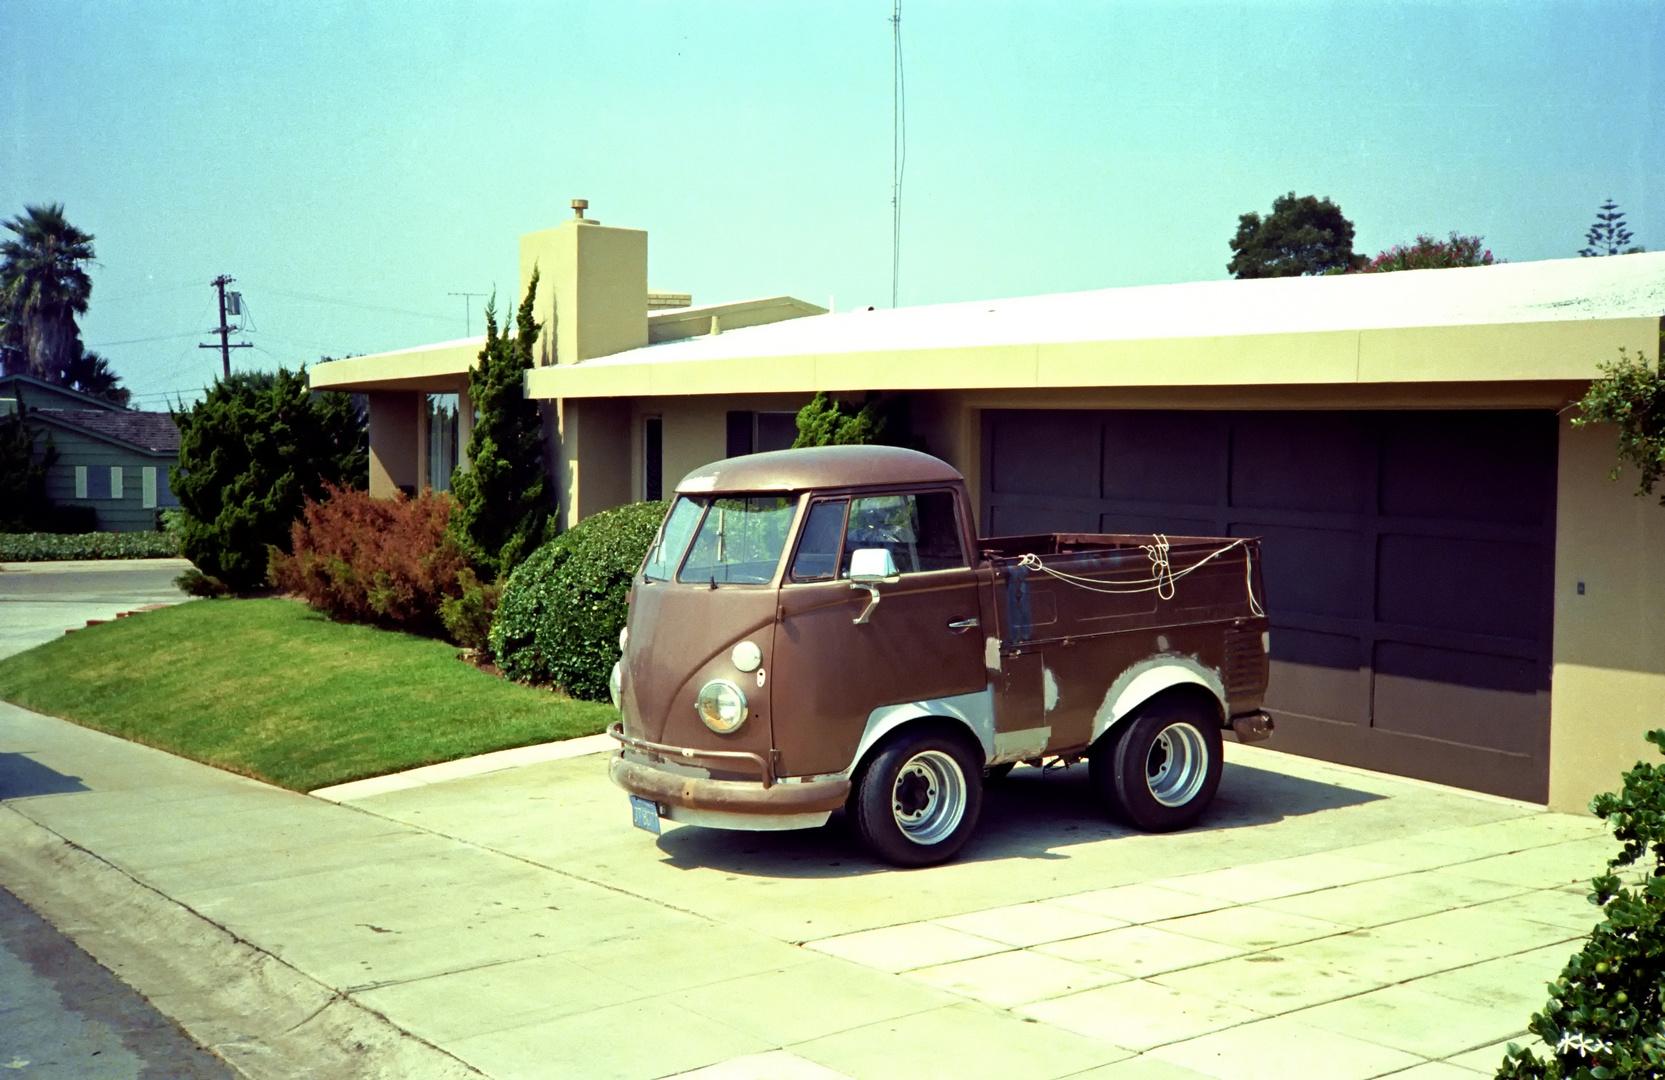 vw bulli short version 1979 foto bild north america. Black Bedroom Furniture Sets. Home Design Ideas